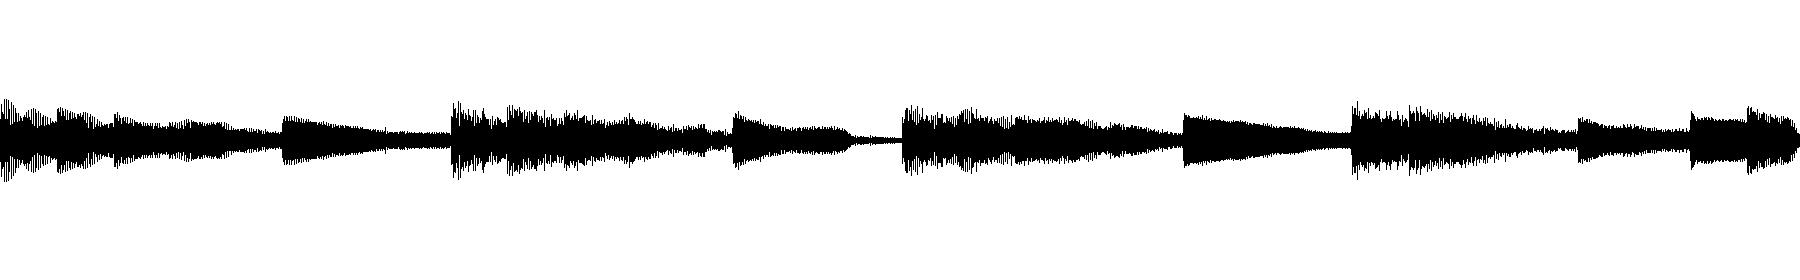 vinyl piano melody loop 103 bpm dbm